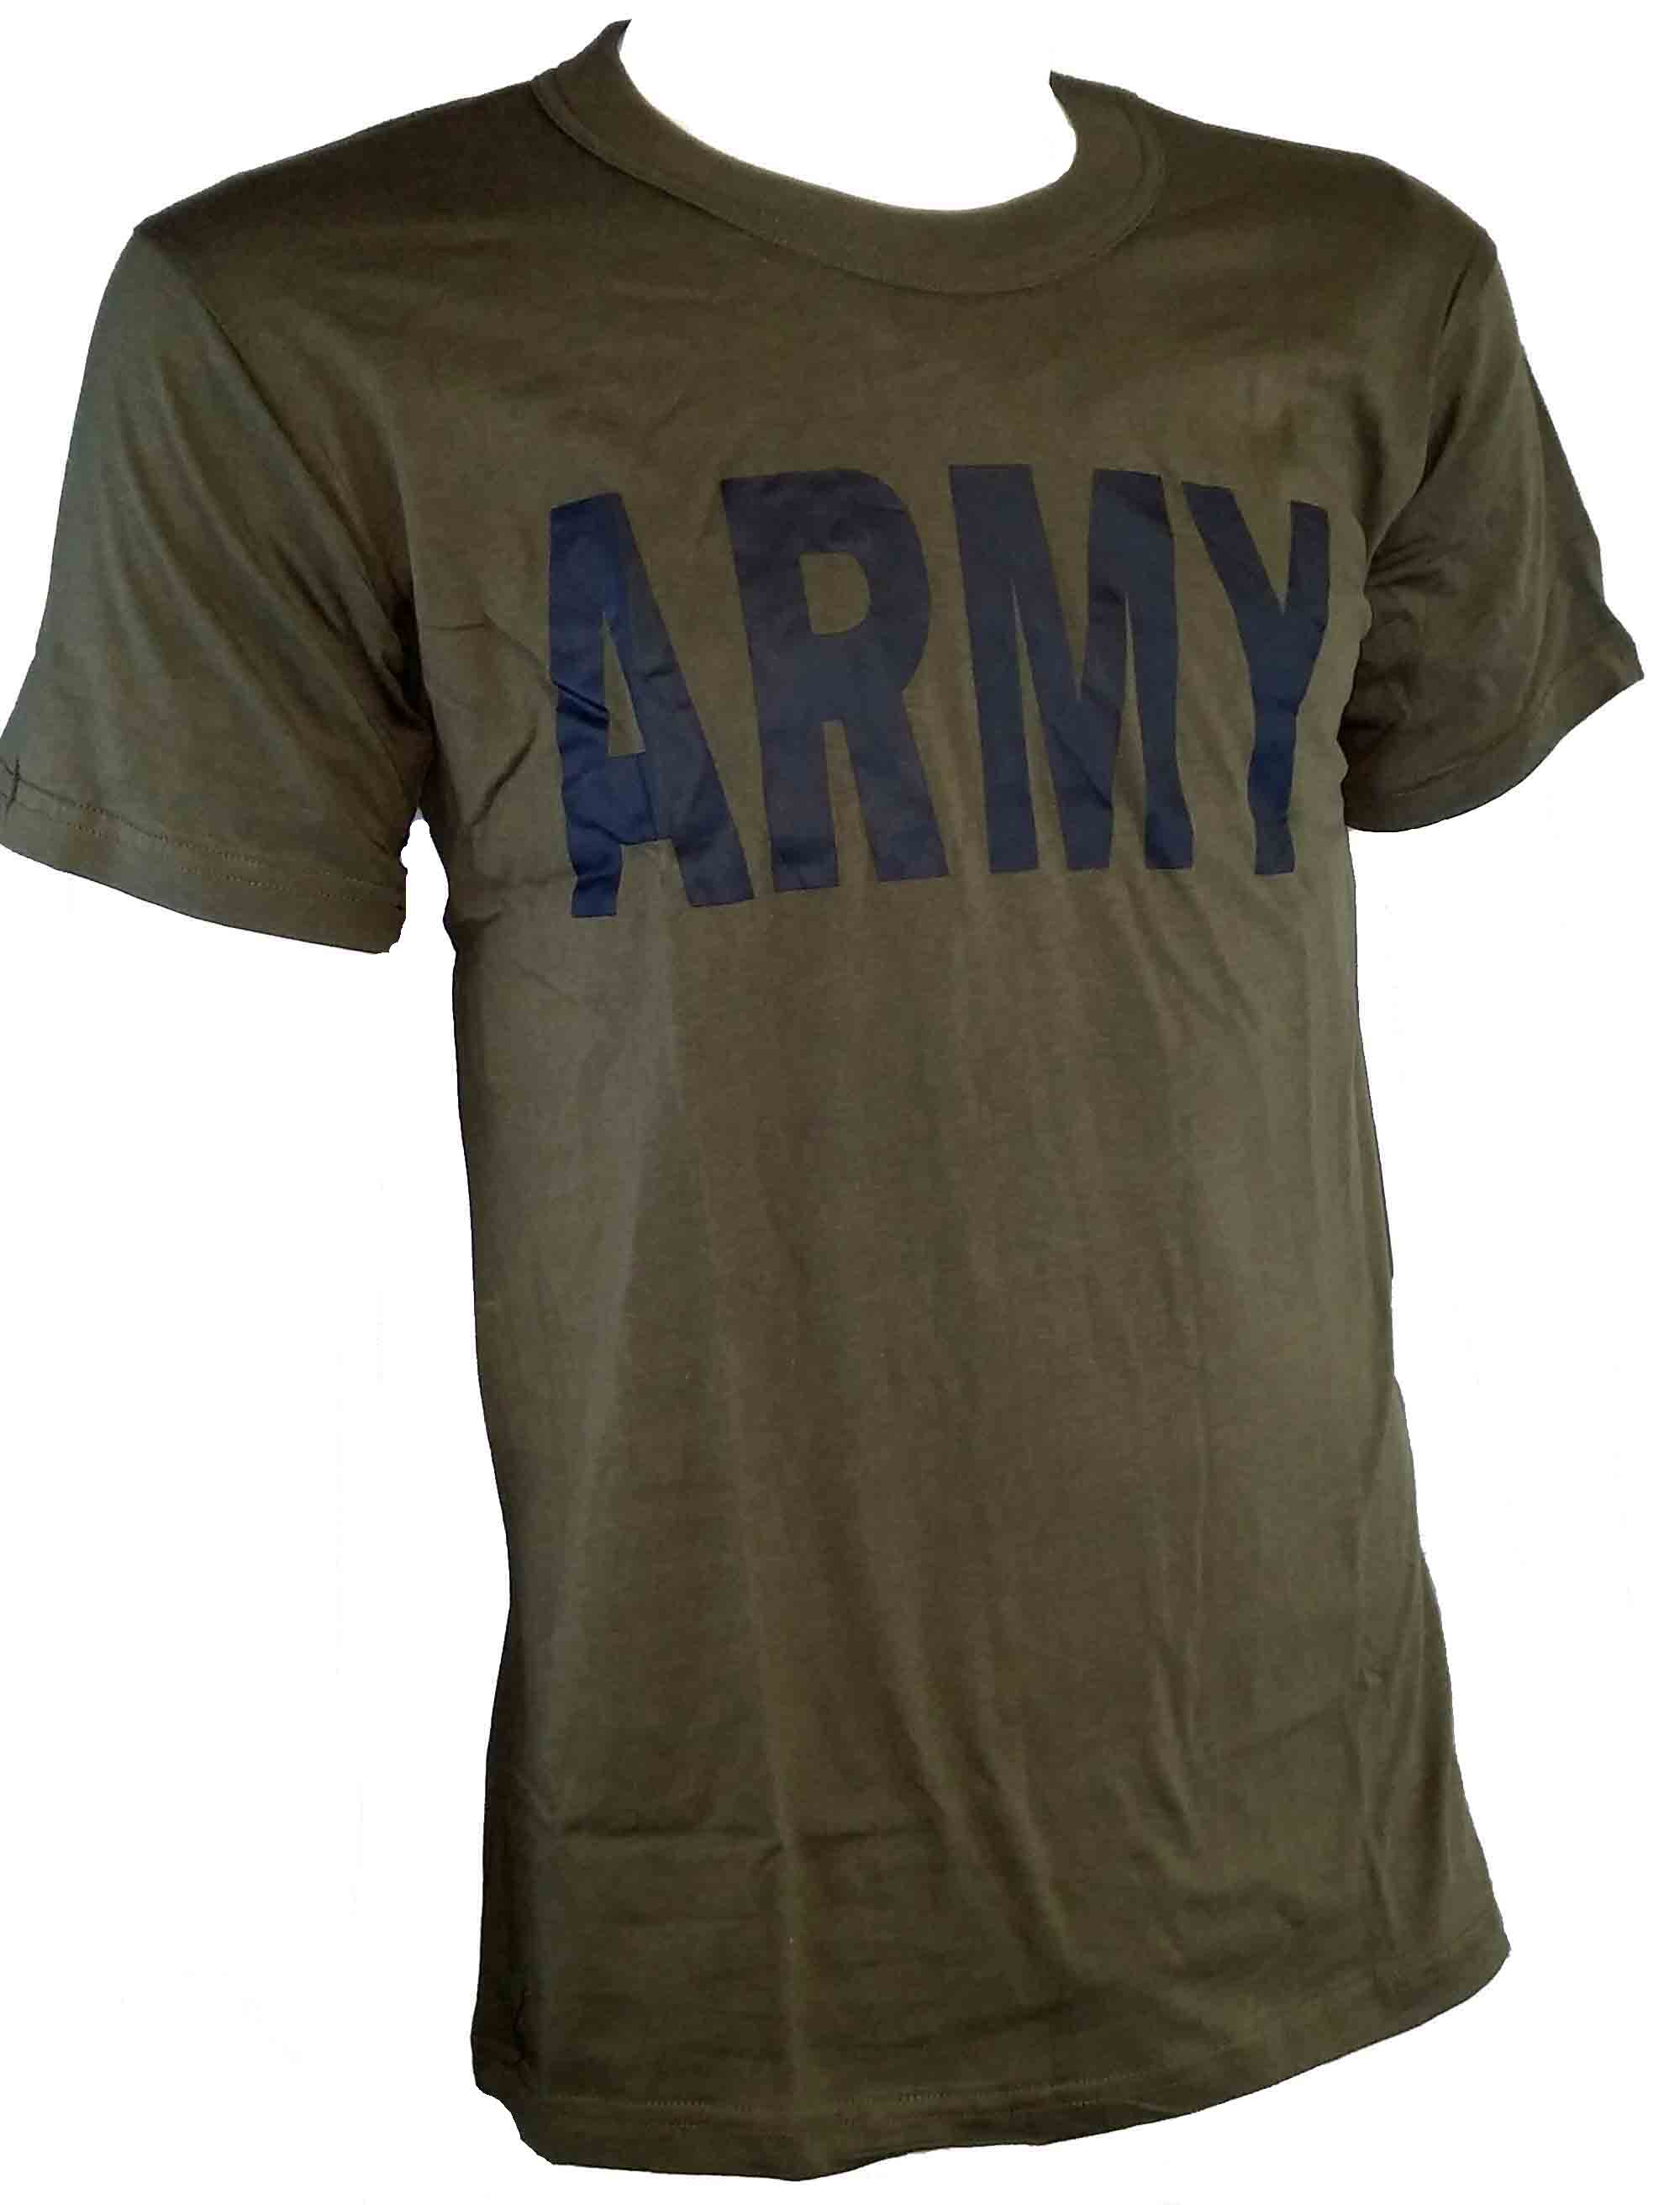 T-SHIRT OLIVE AVEC LOGO ARMY